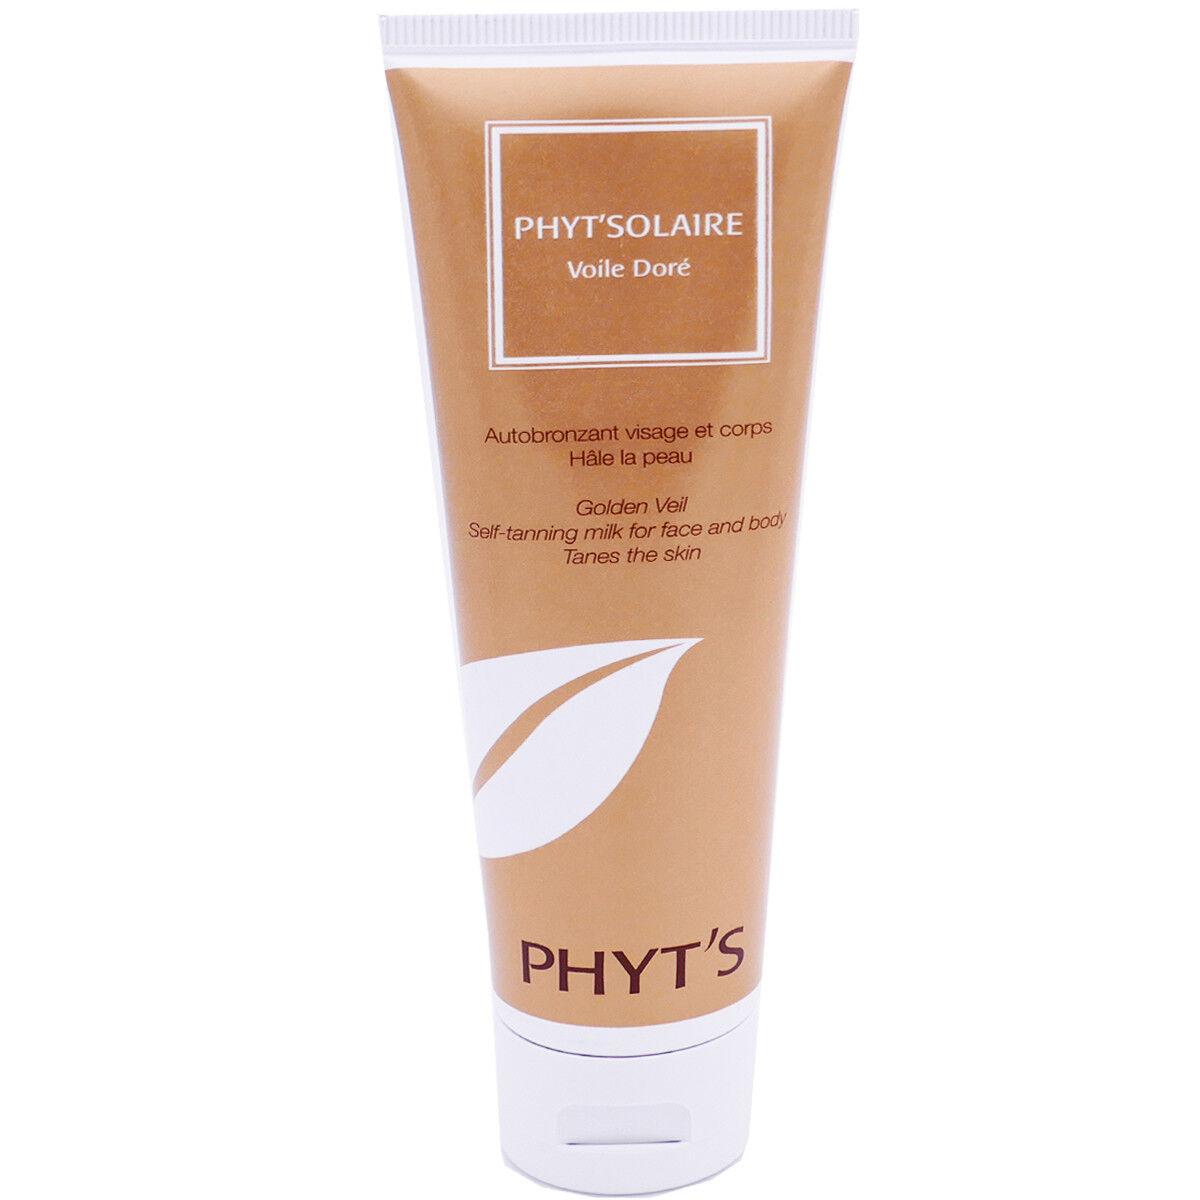 Phyt's autobronzant visage et corps 100 ml